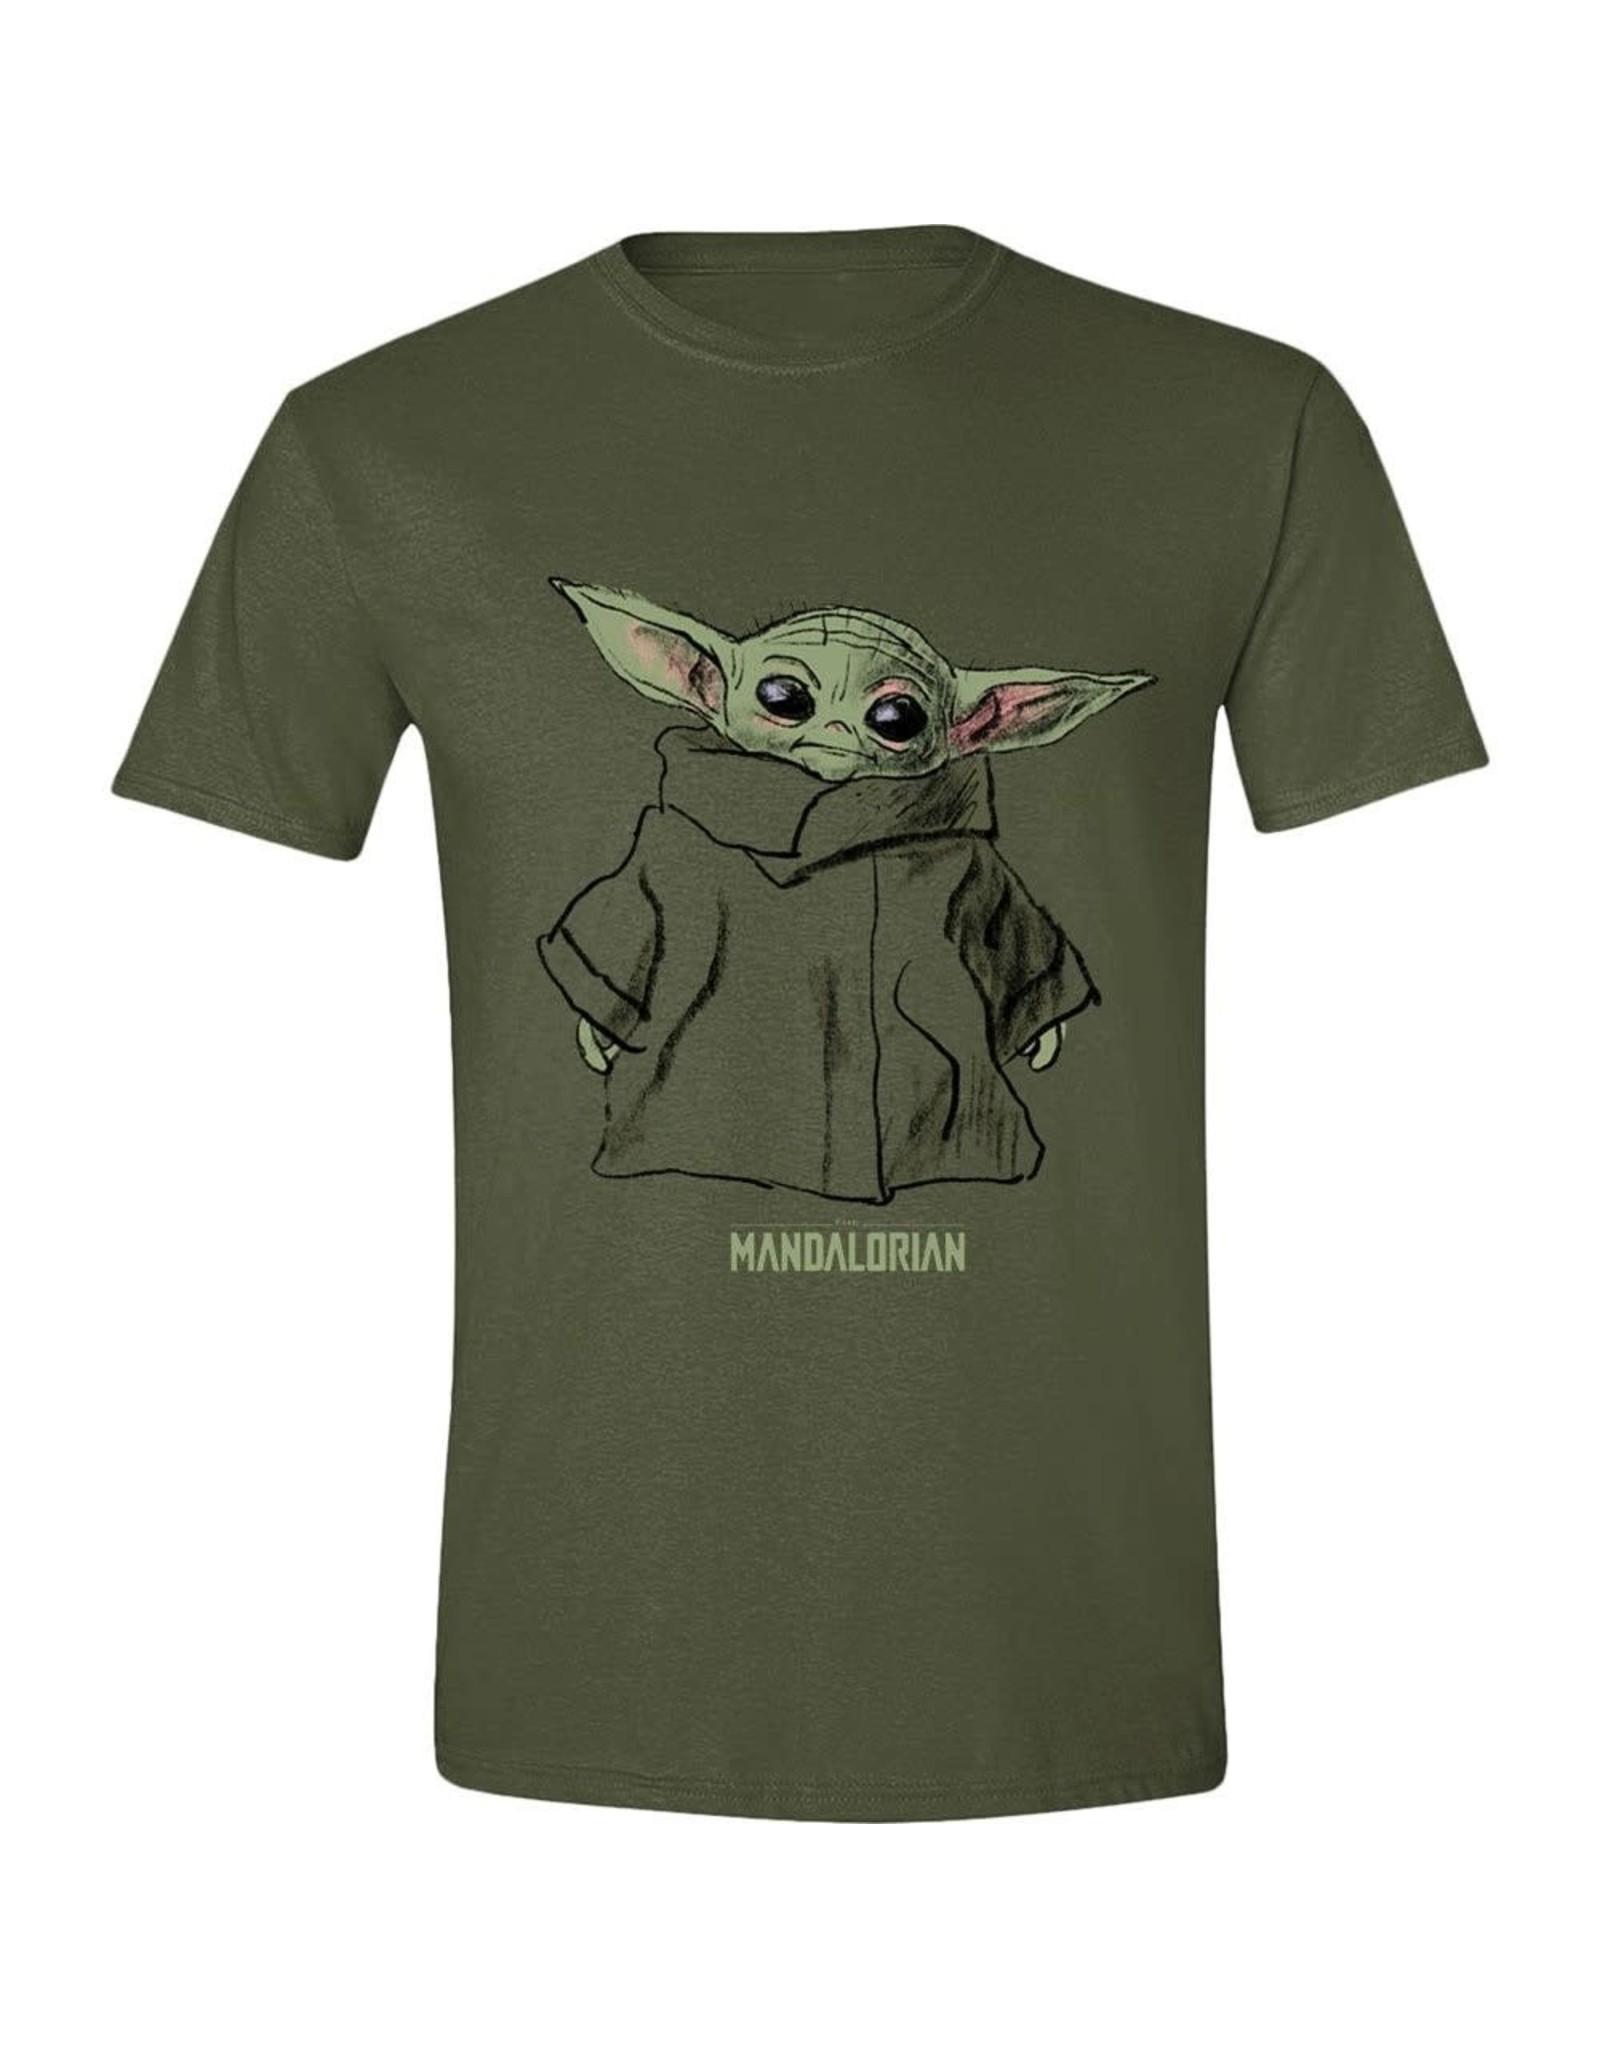 THE MANDALORIAN T-Shirt (M) - The Child Sketch